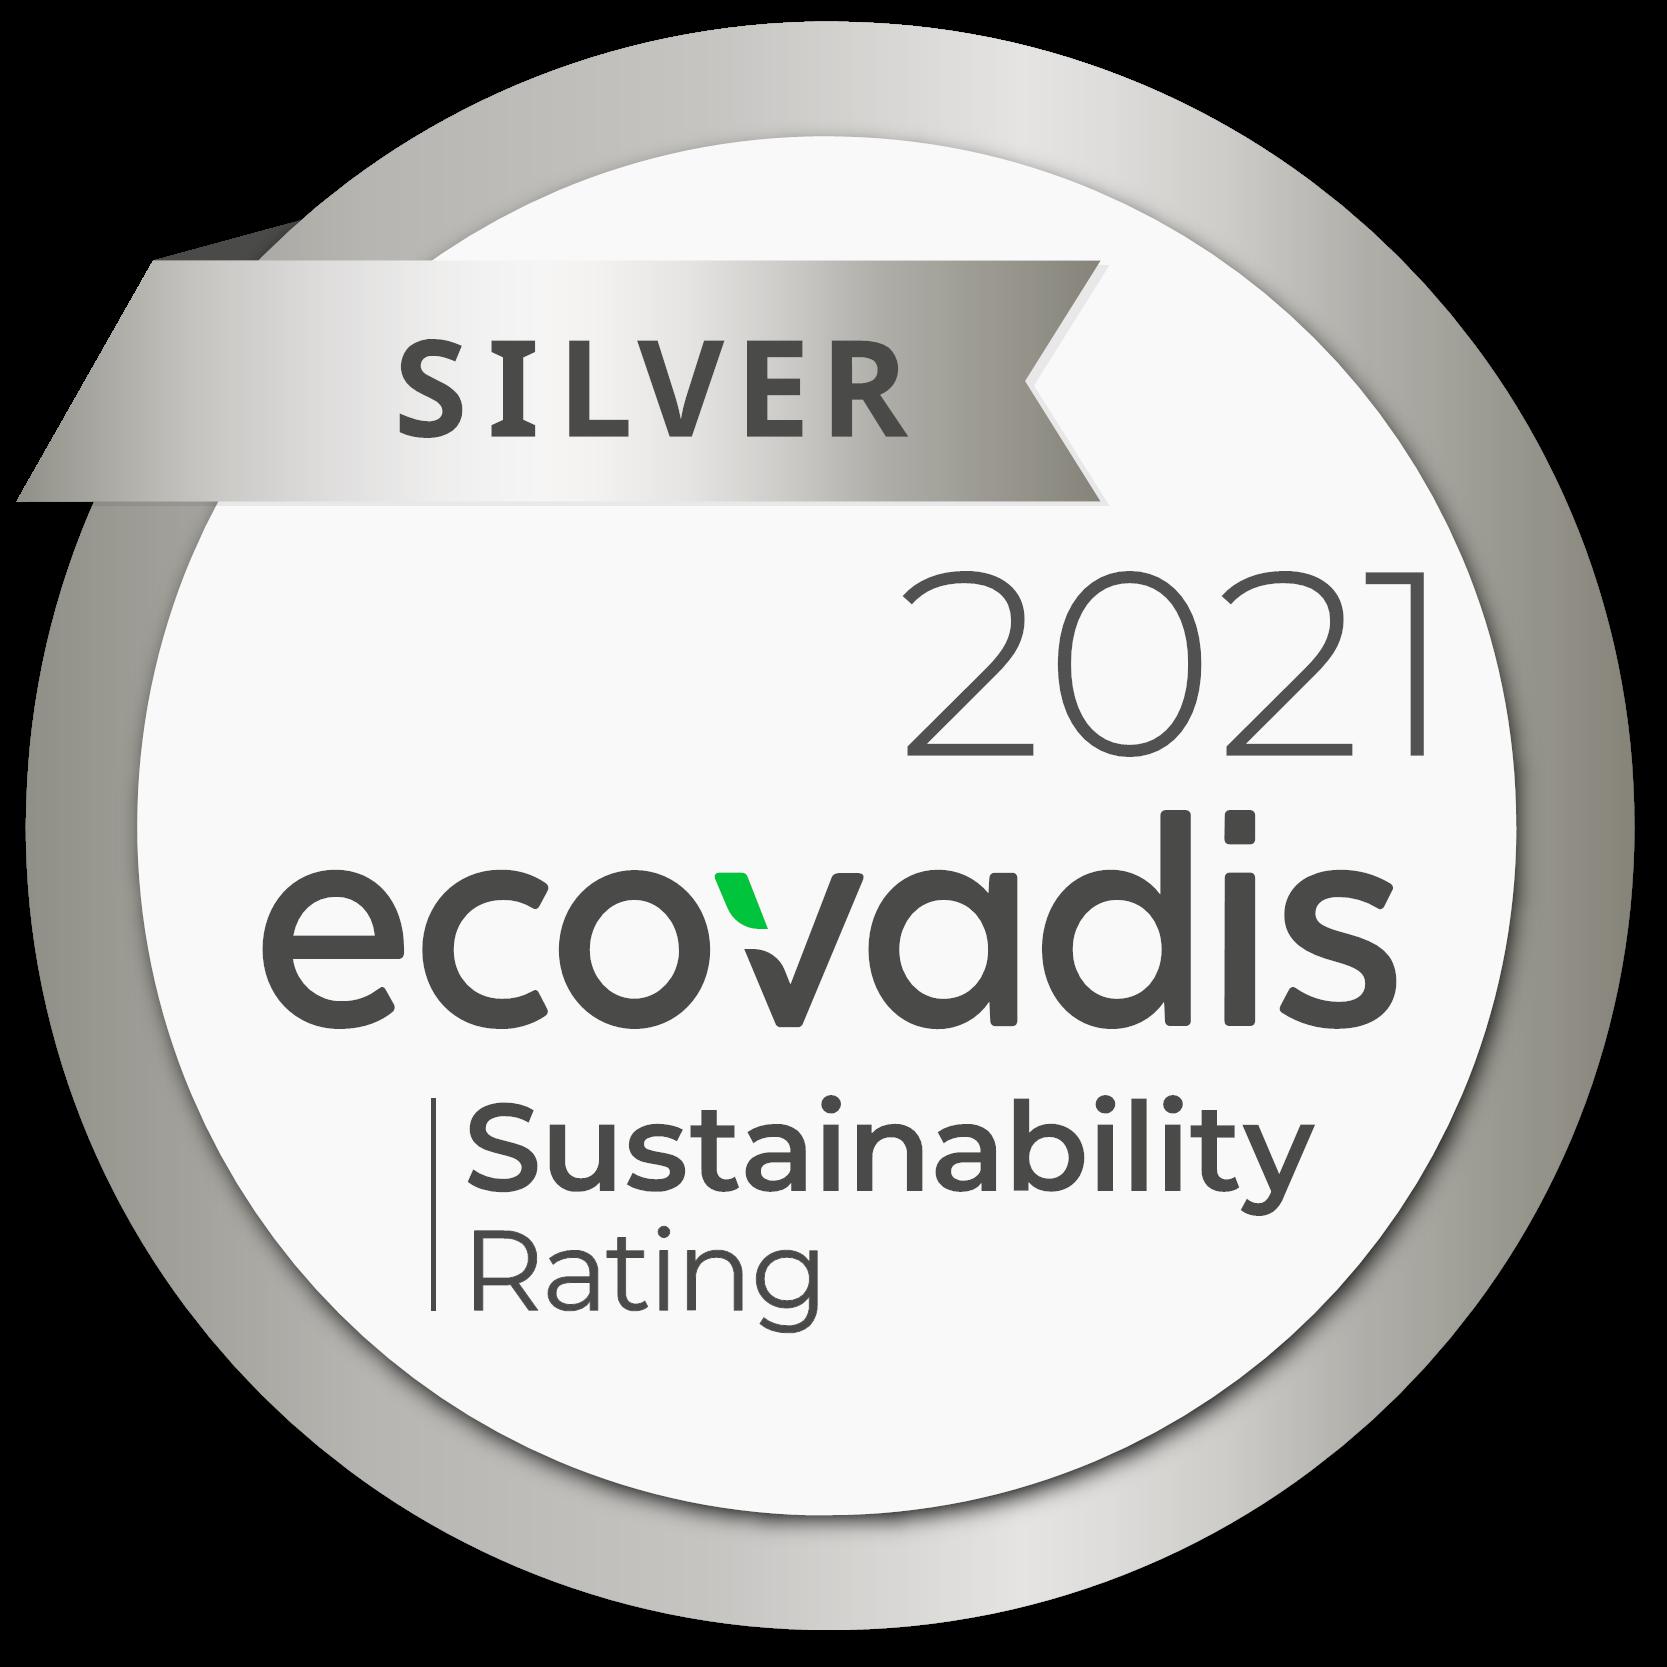 ecovadis silver 2021 label